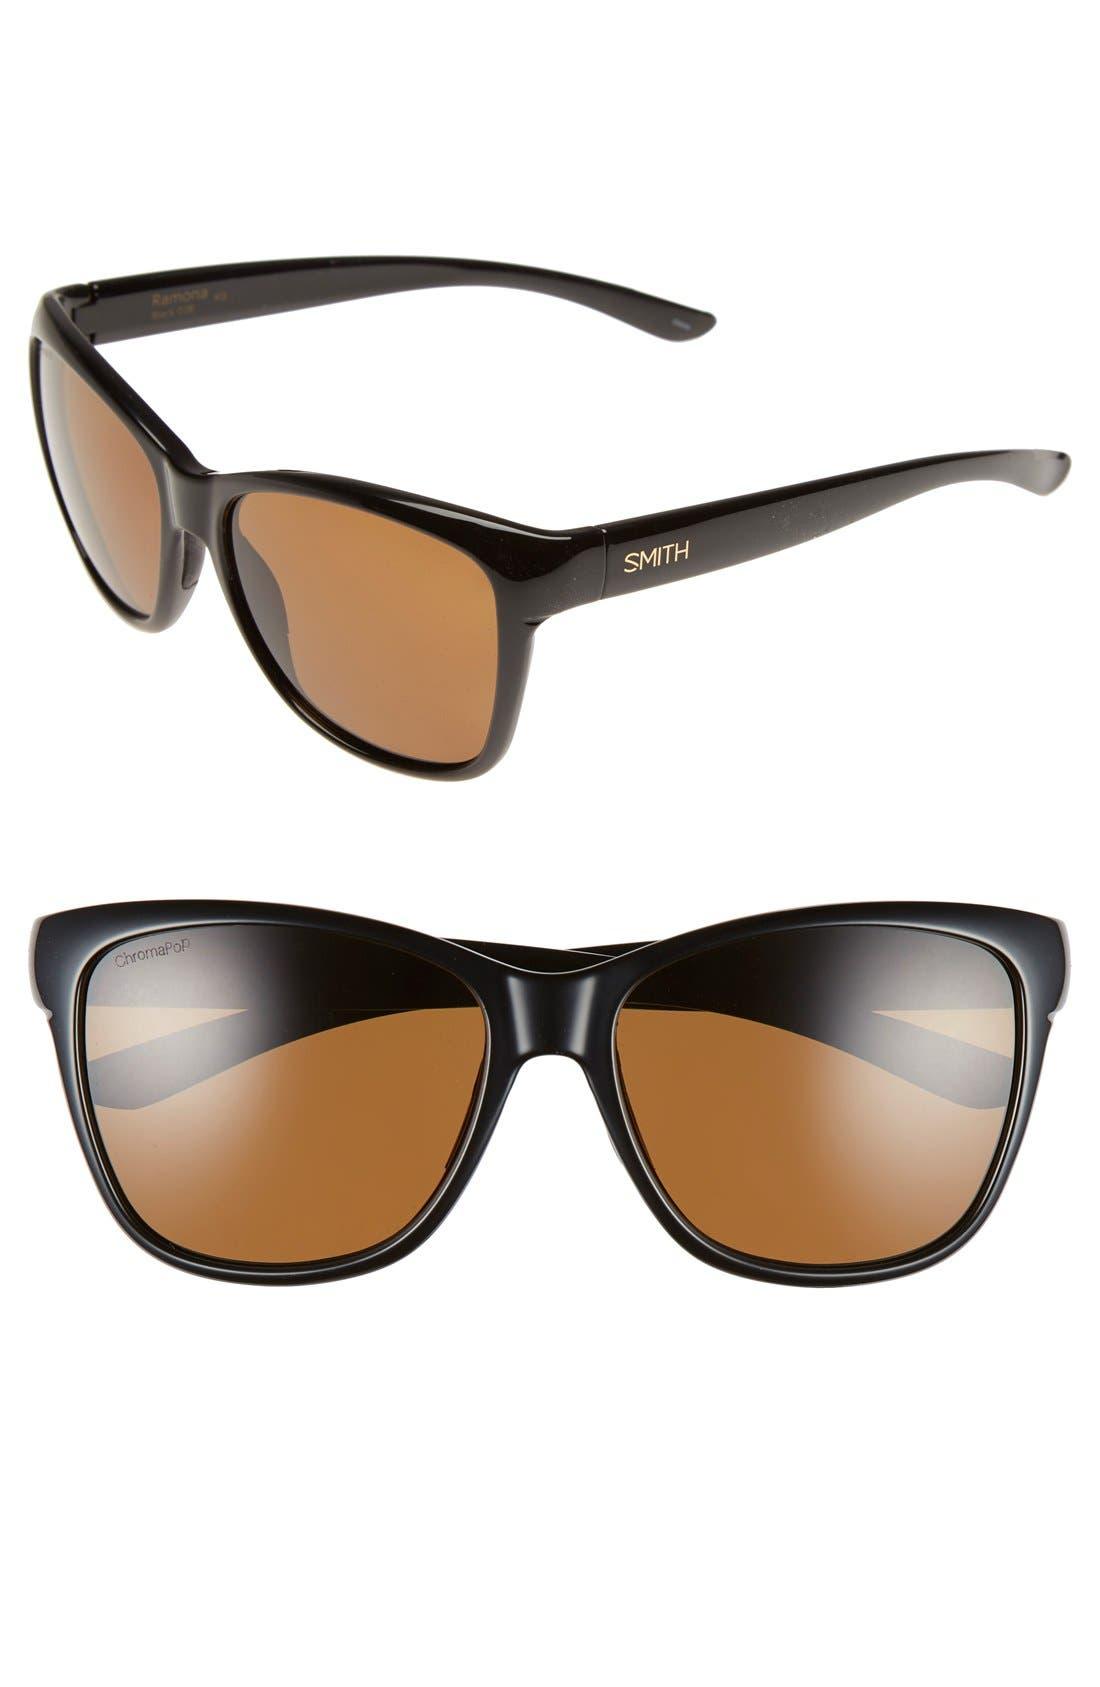 SMITH 'Ramona' 56mm ChromaPop Polarized Sunglasses, Main, color, 001